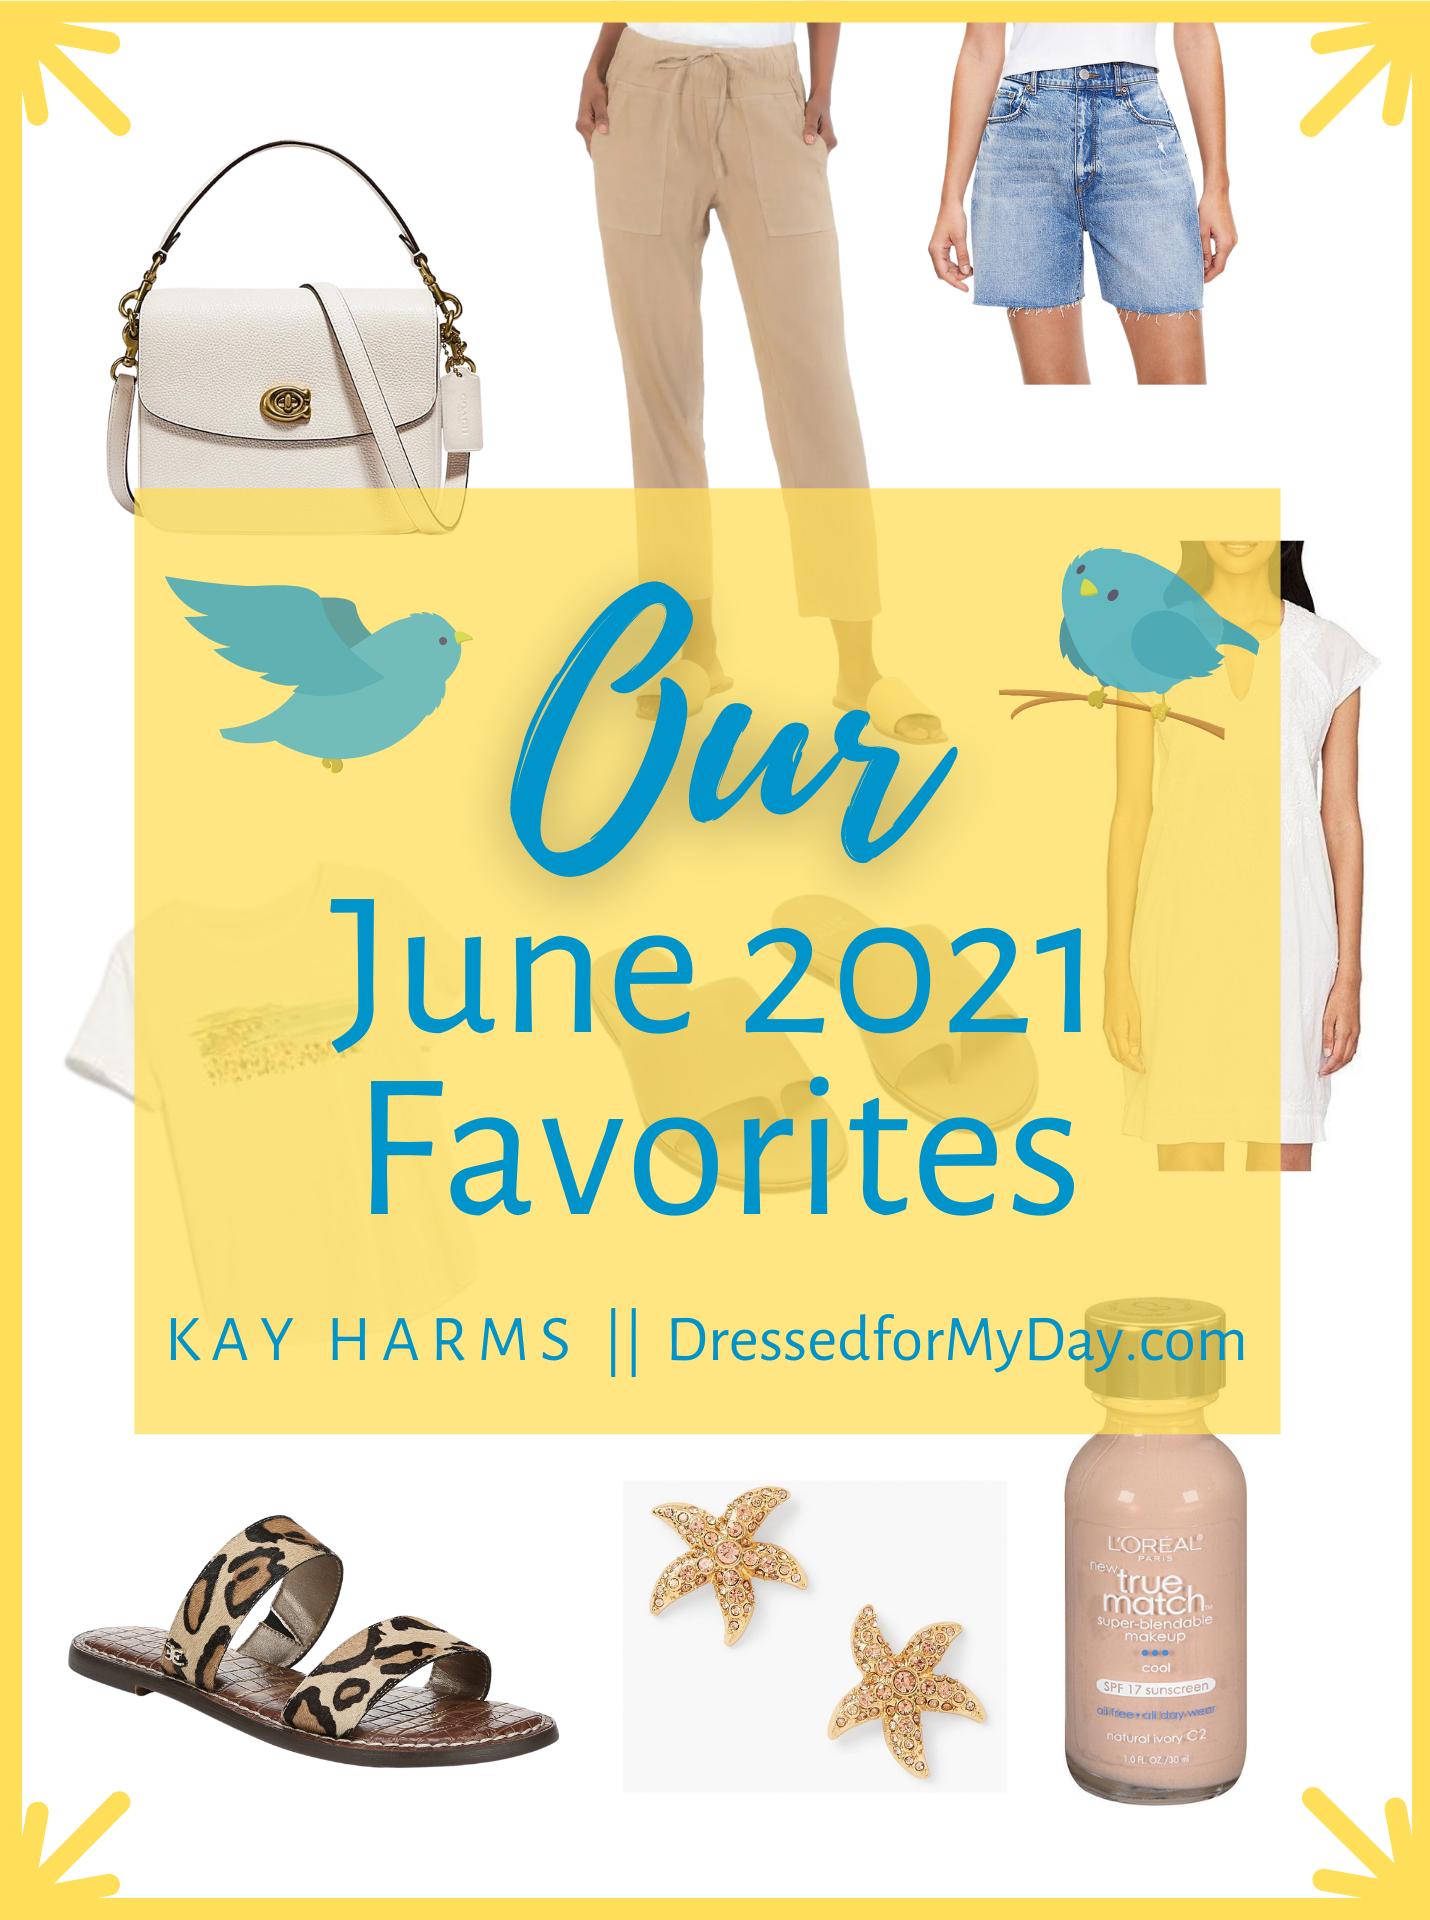 Our June 2021 Favorites